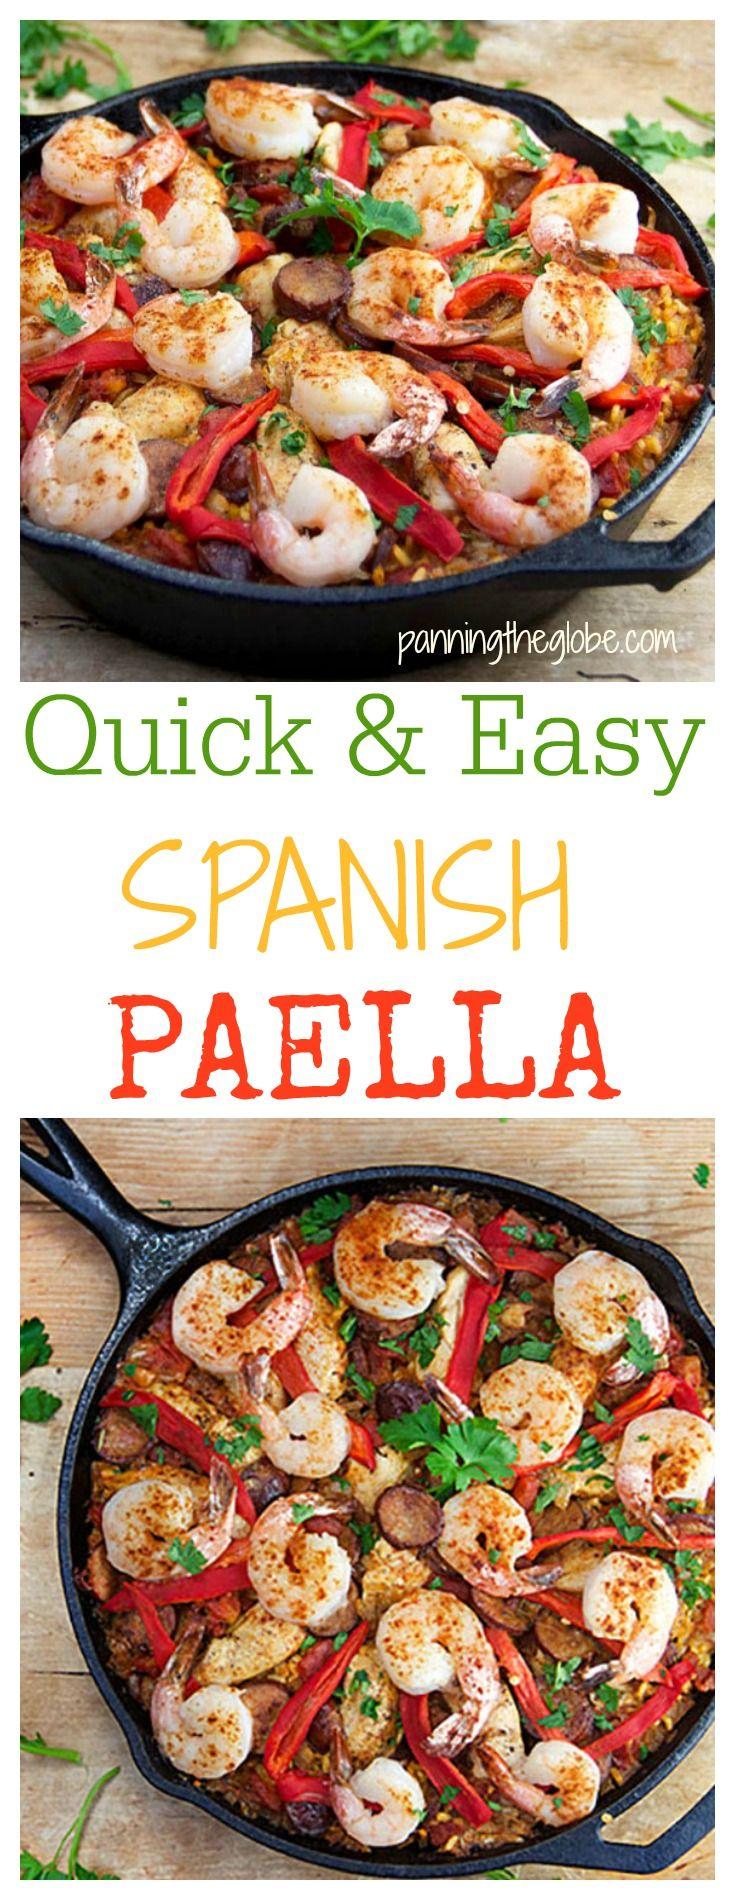 Easy paella recipe food network best easy recipes easy paella recipe food network forumfinder Images